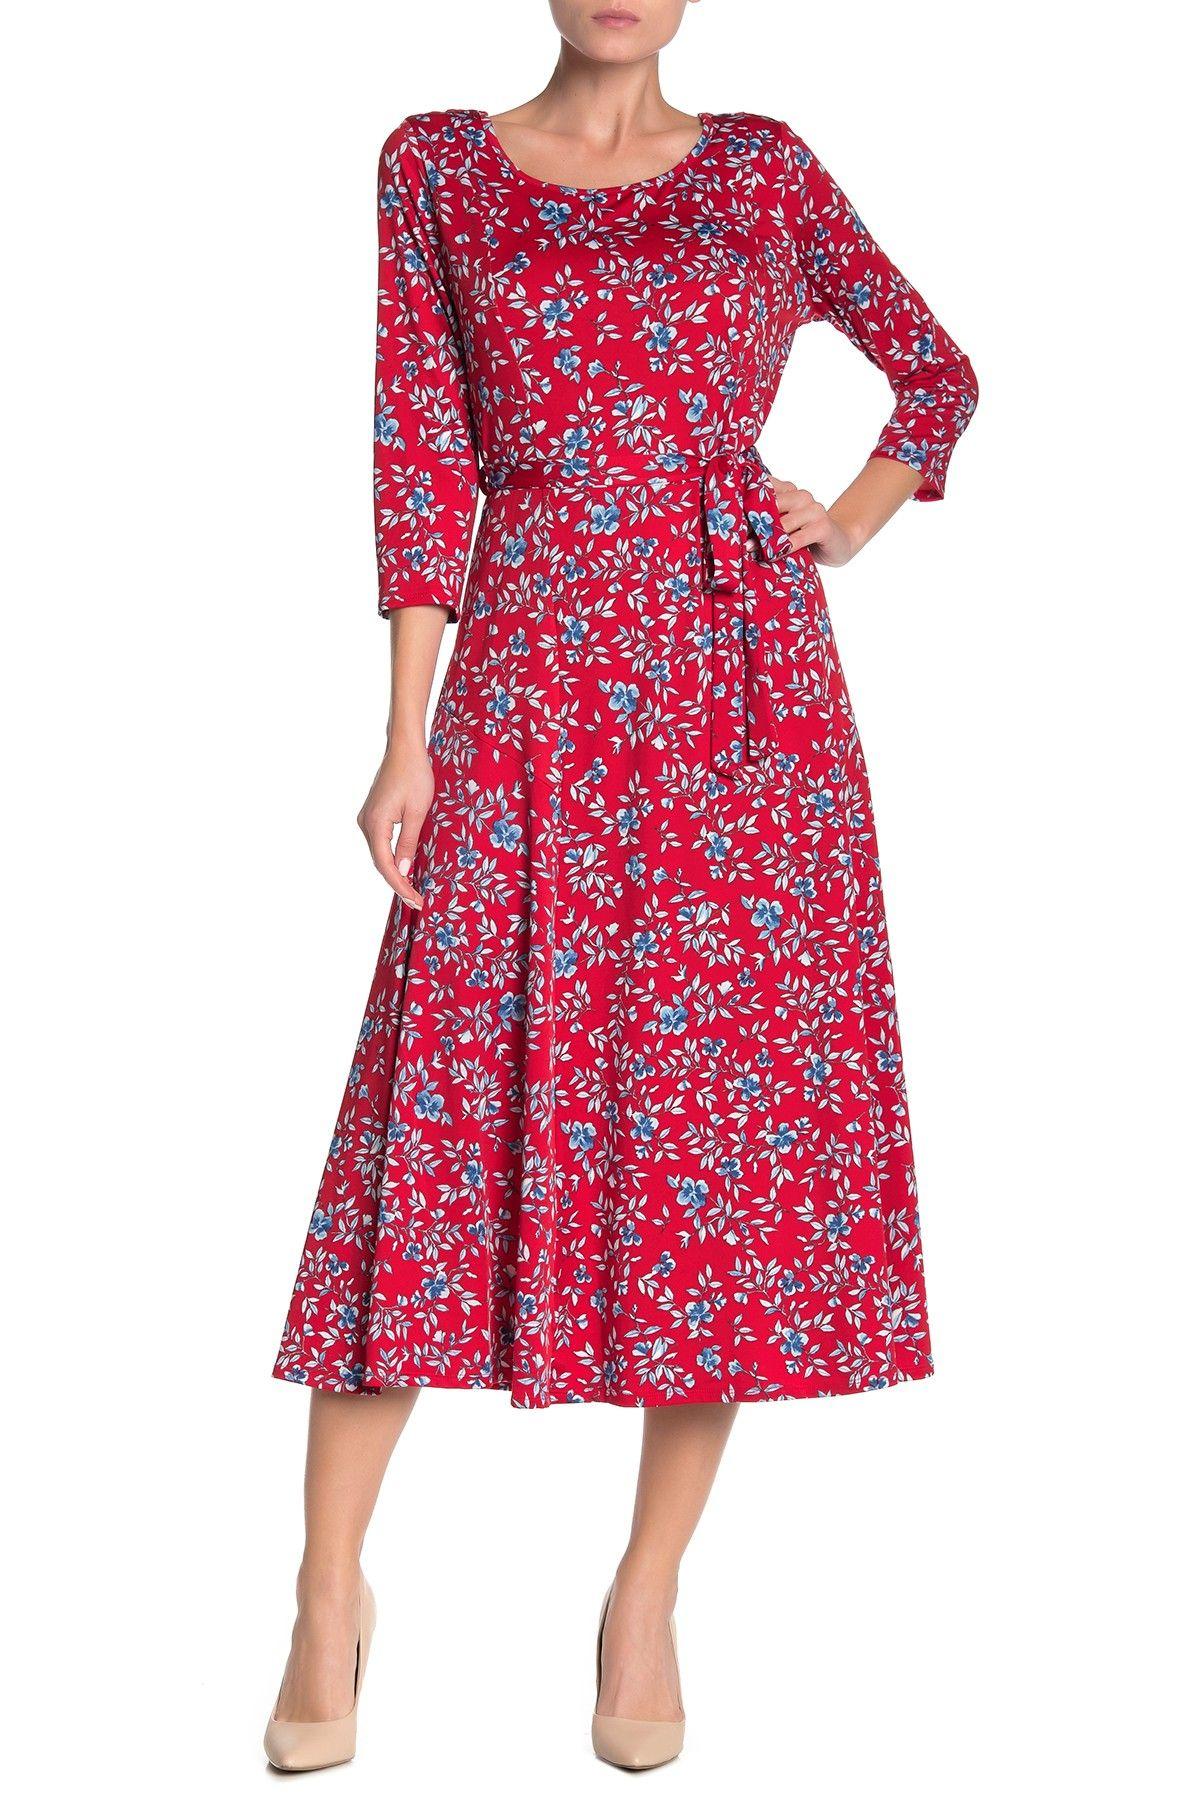 Nina Leonard Crew Neck 3 4 Length Sleeve Midi Dress Nordstrom Rack Midi Dress With Sleeves Nordstrom Dresses Womens Dresses [ 1800 x 1200 Pixel ]